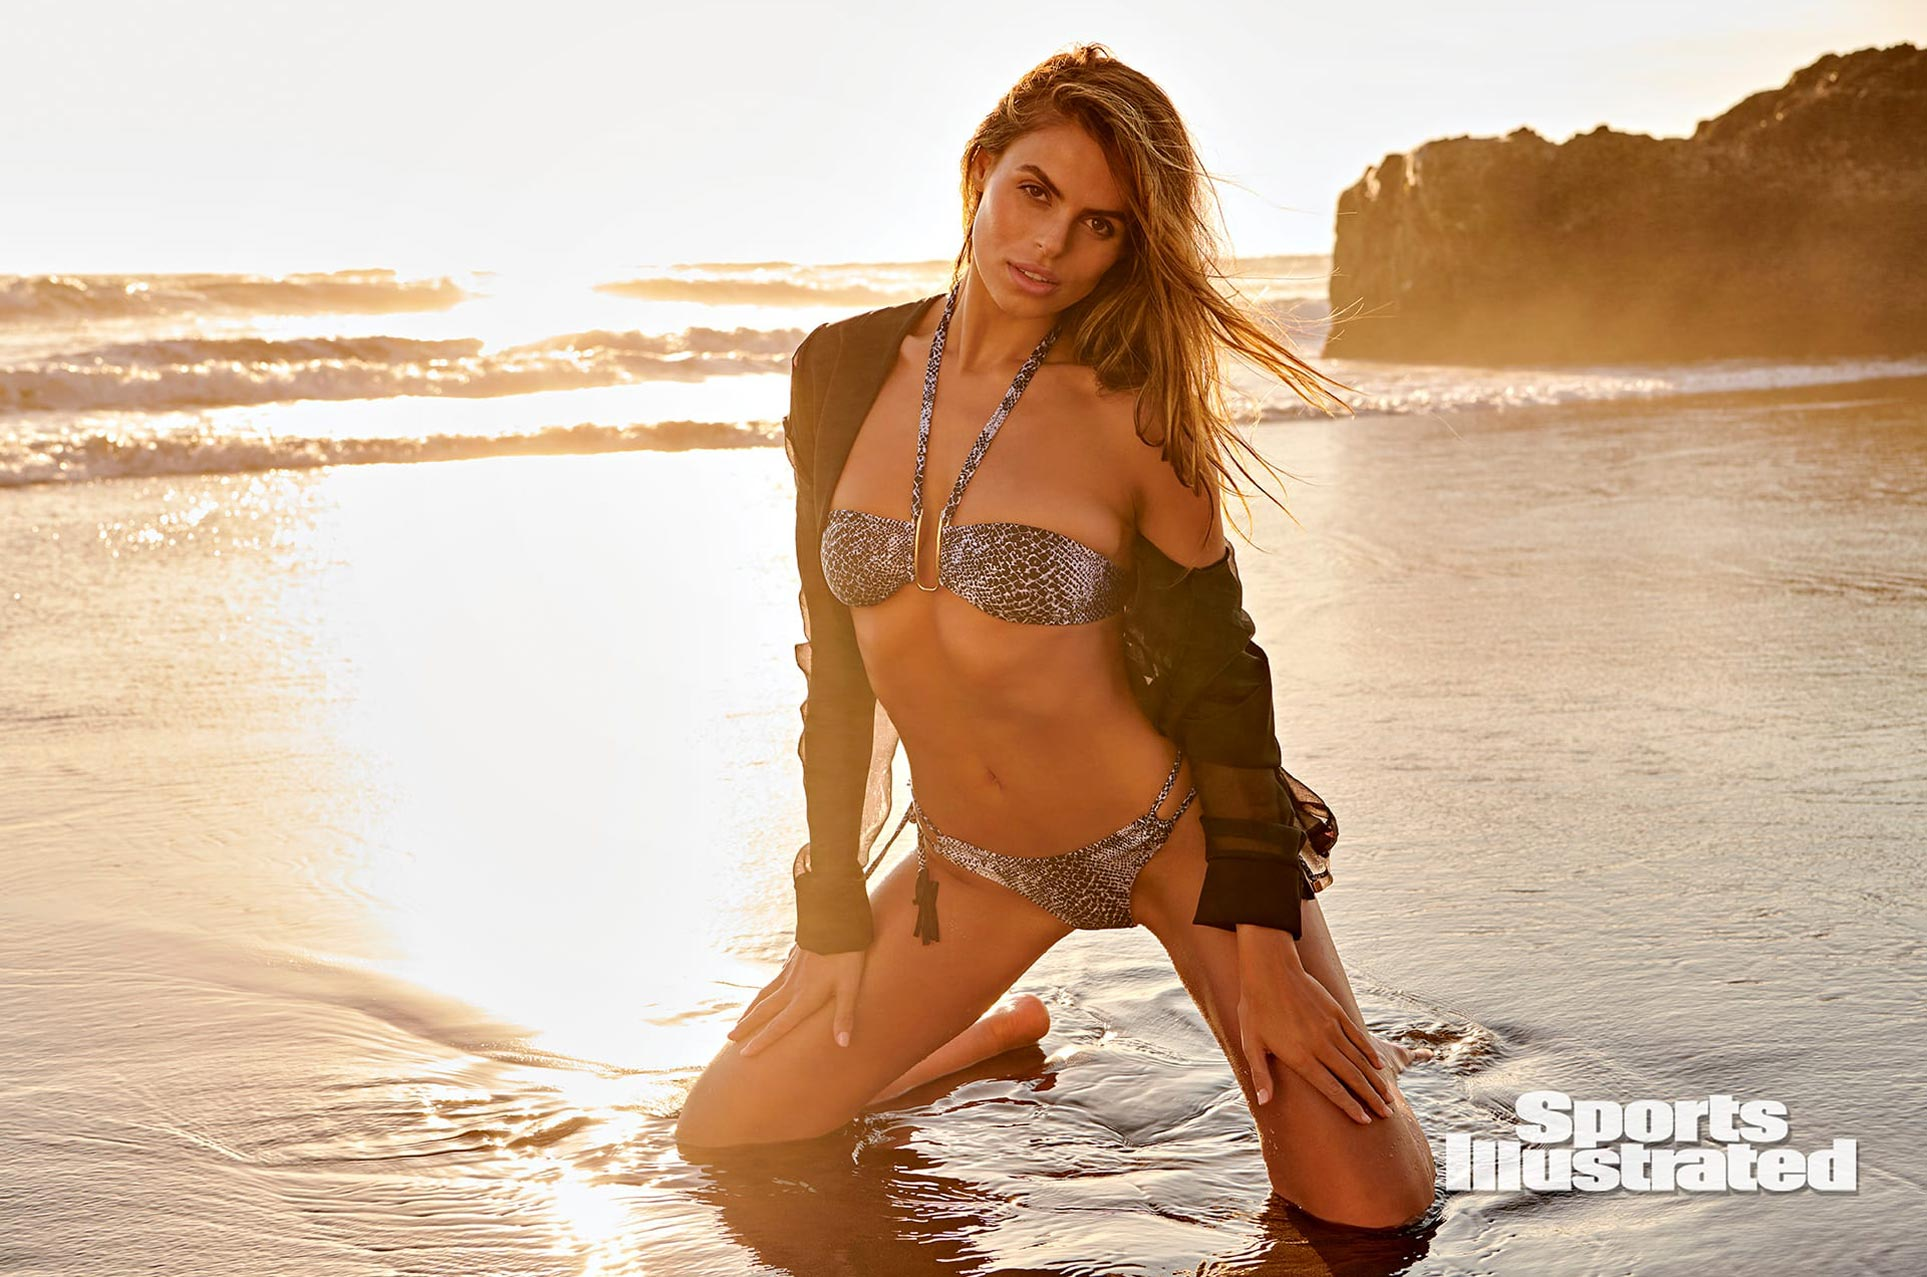 Брукс Надер в каталоге купальников Sports Illustrated Swimsuit 2020 / фото 06